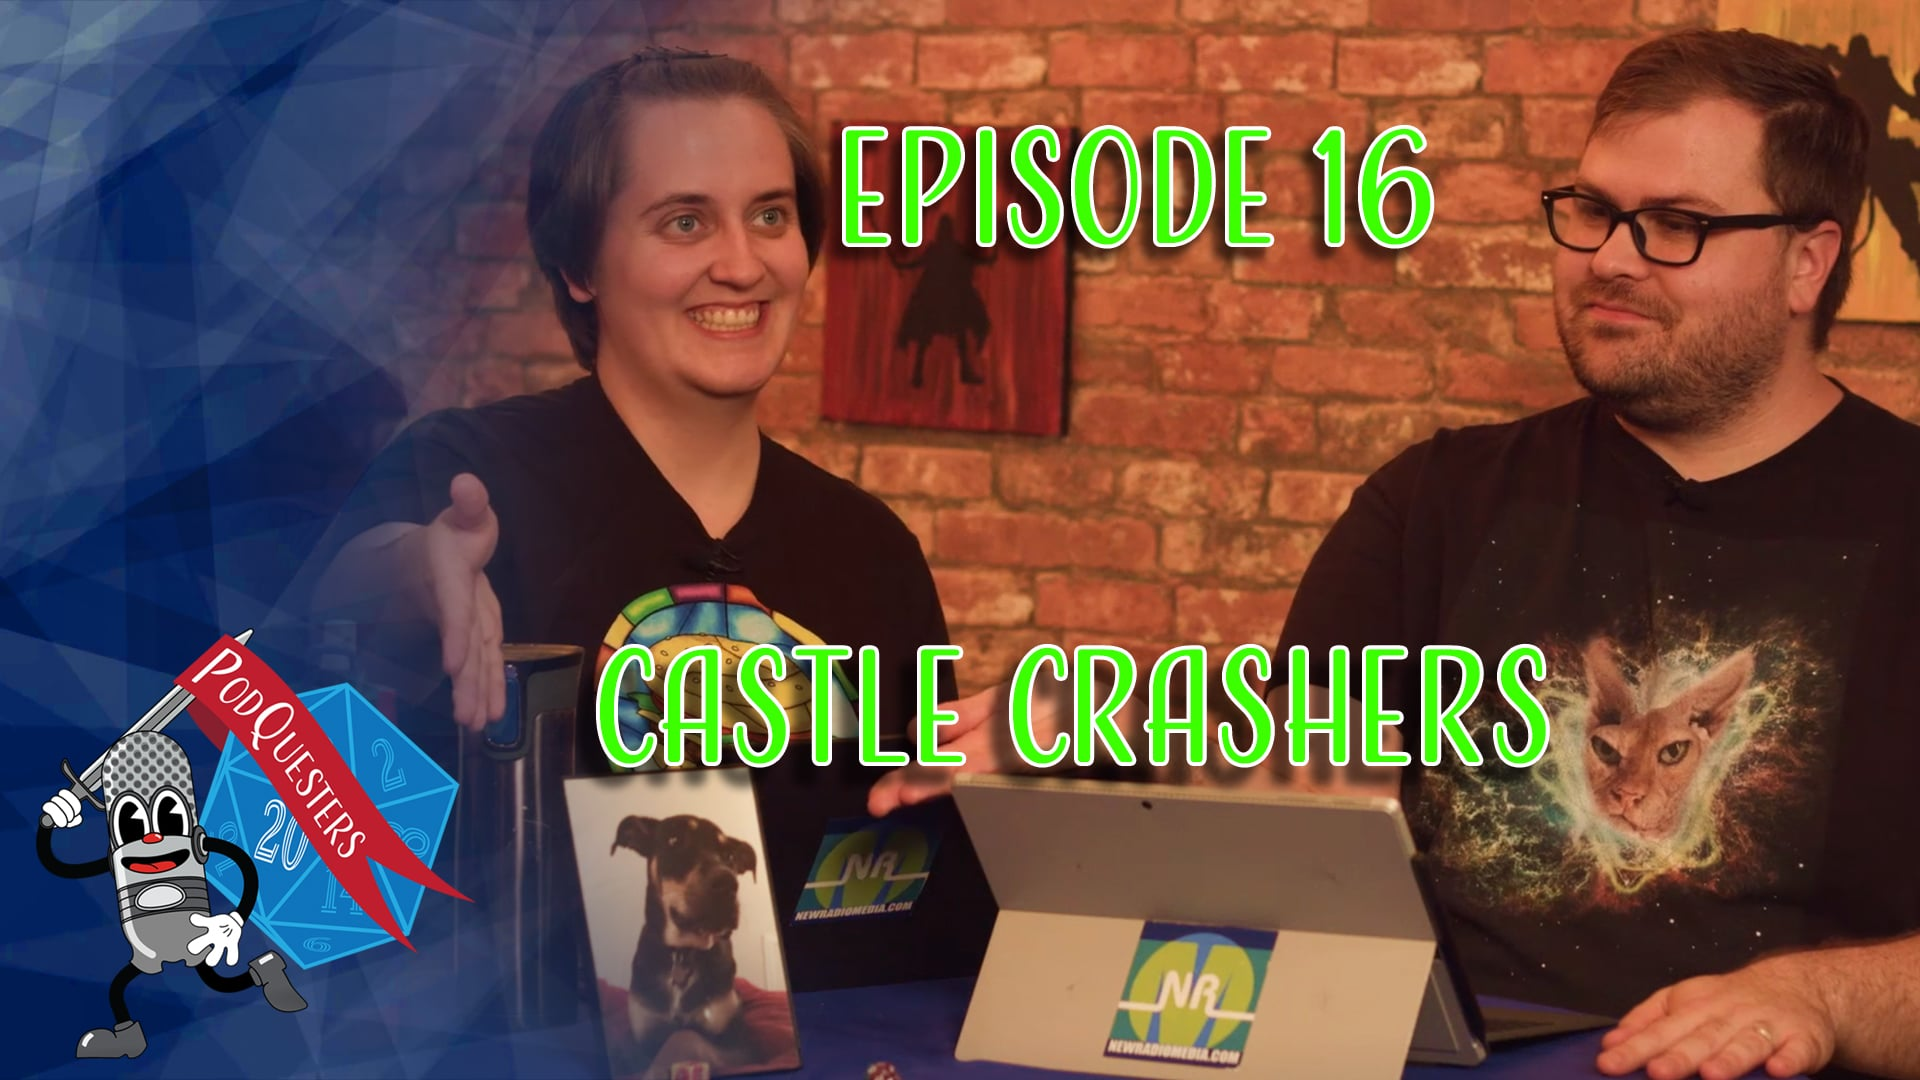 Podquesters - Episode 16: Castle Crashers